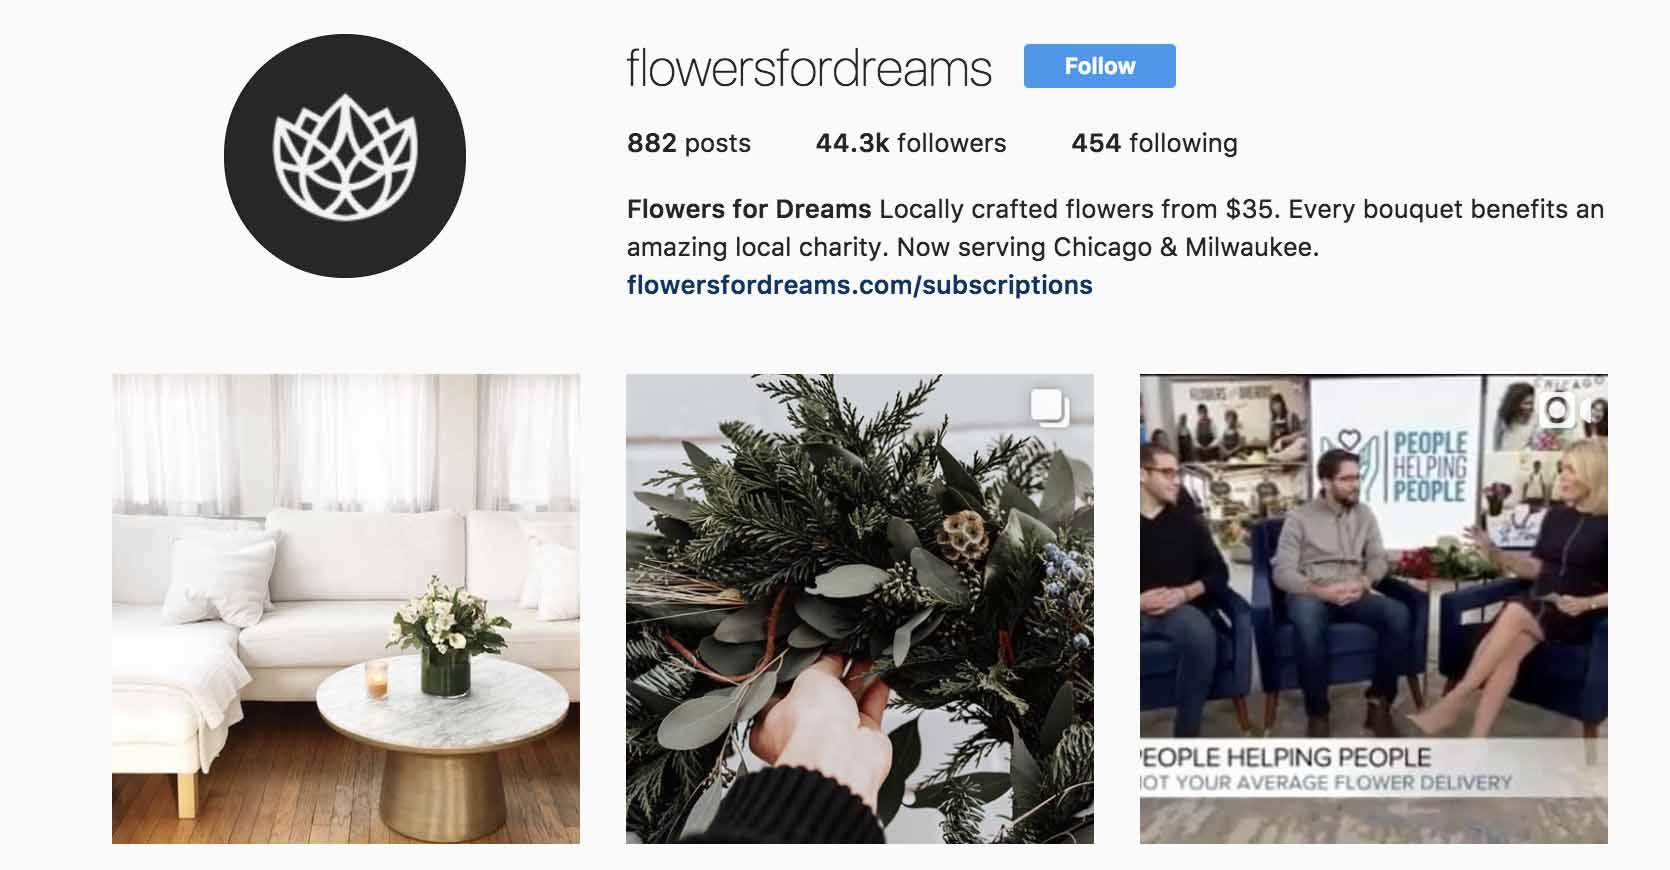 instagram-bio-ideas-flowersfordreams